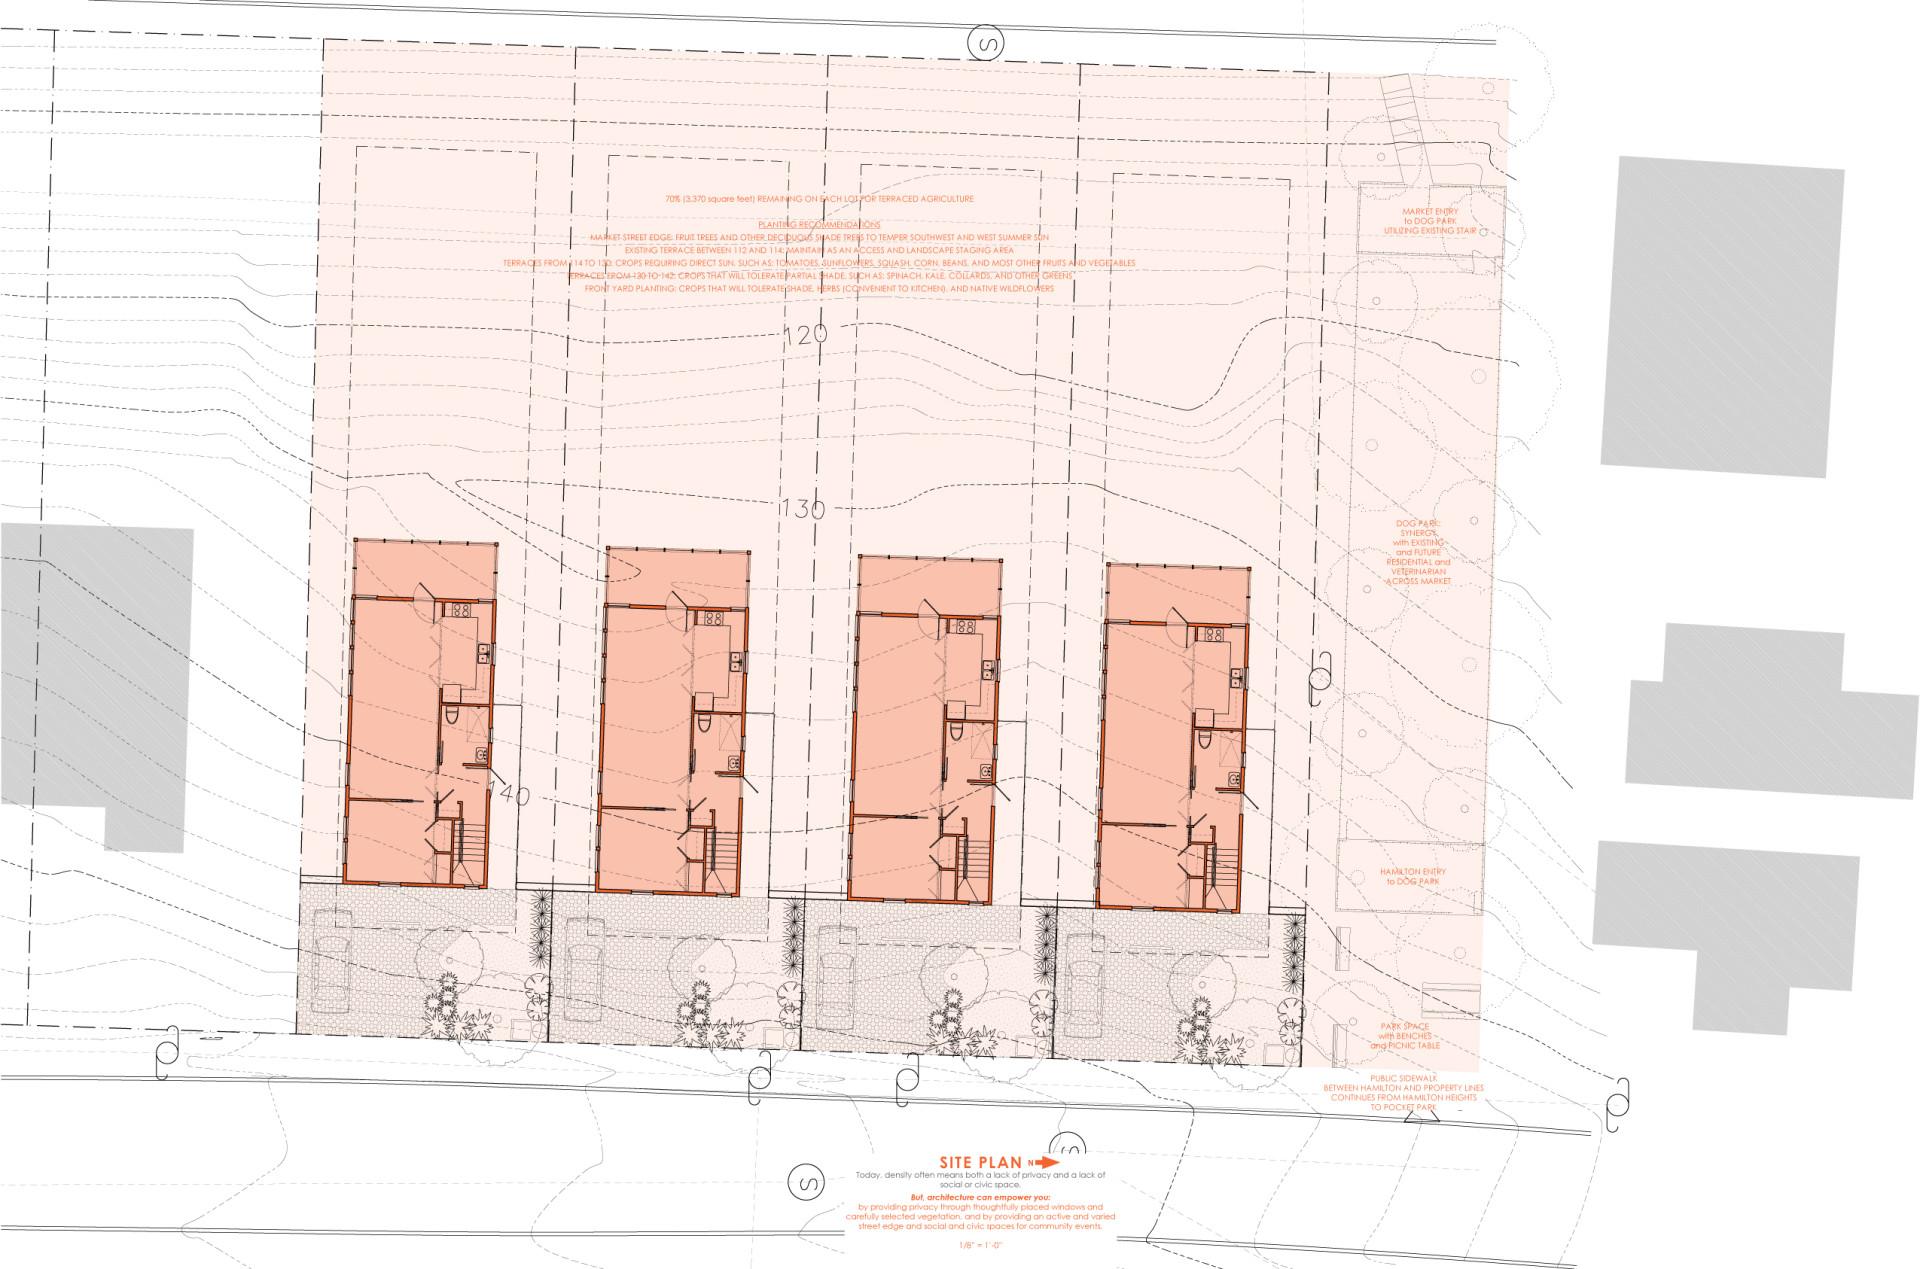 226-Site Plan